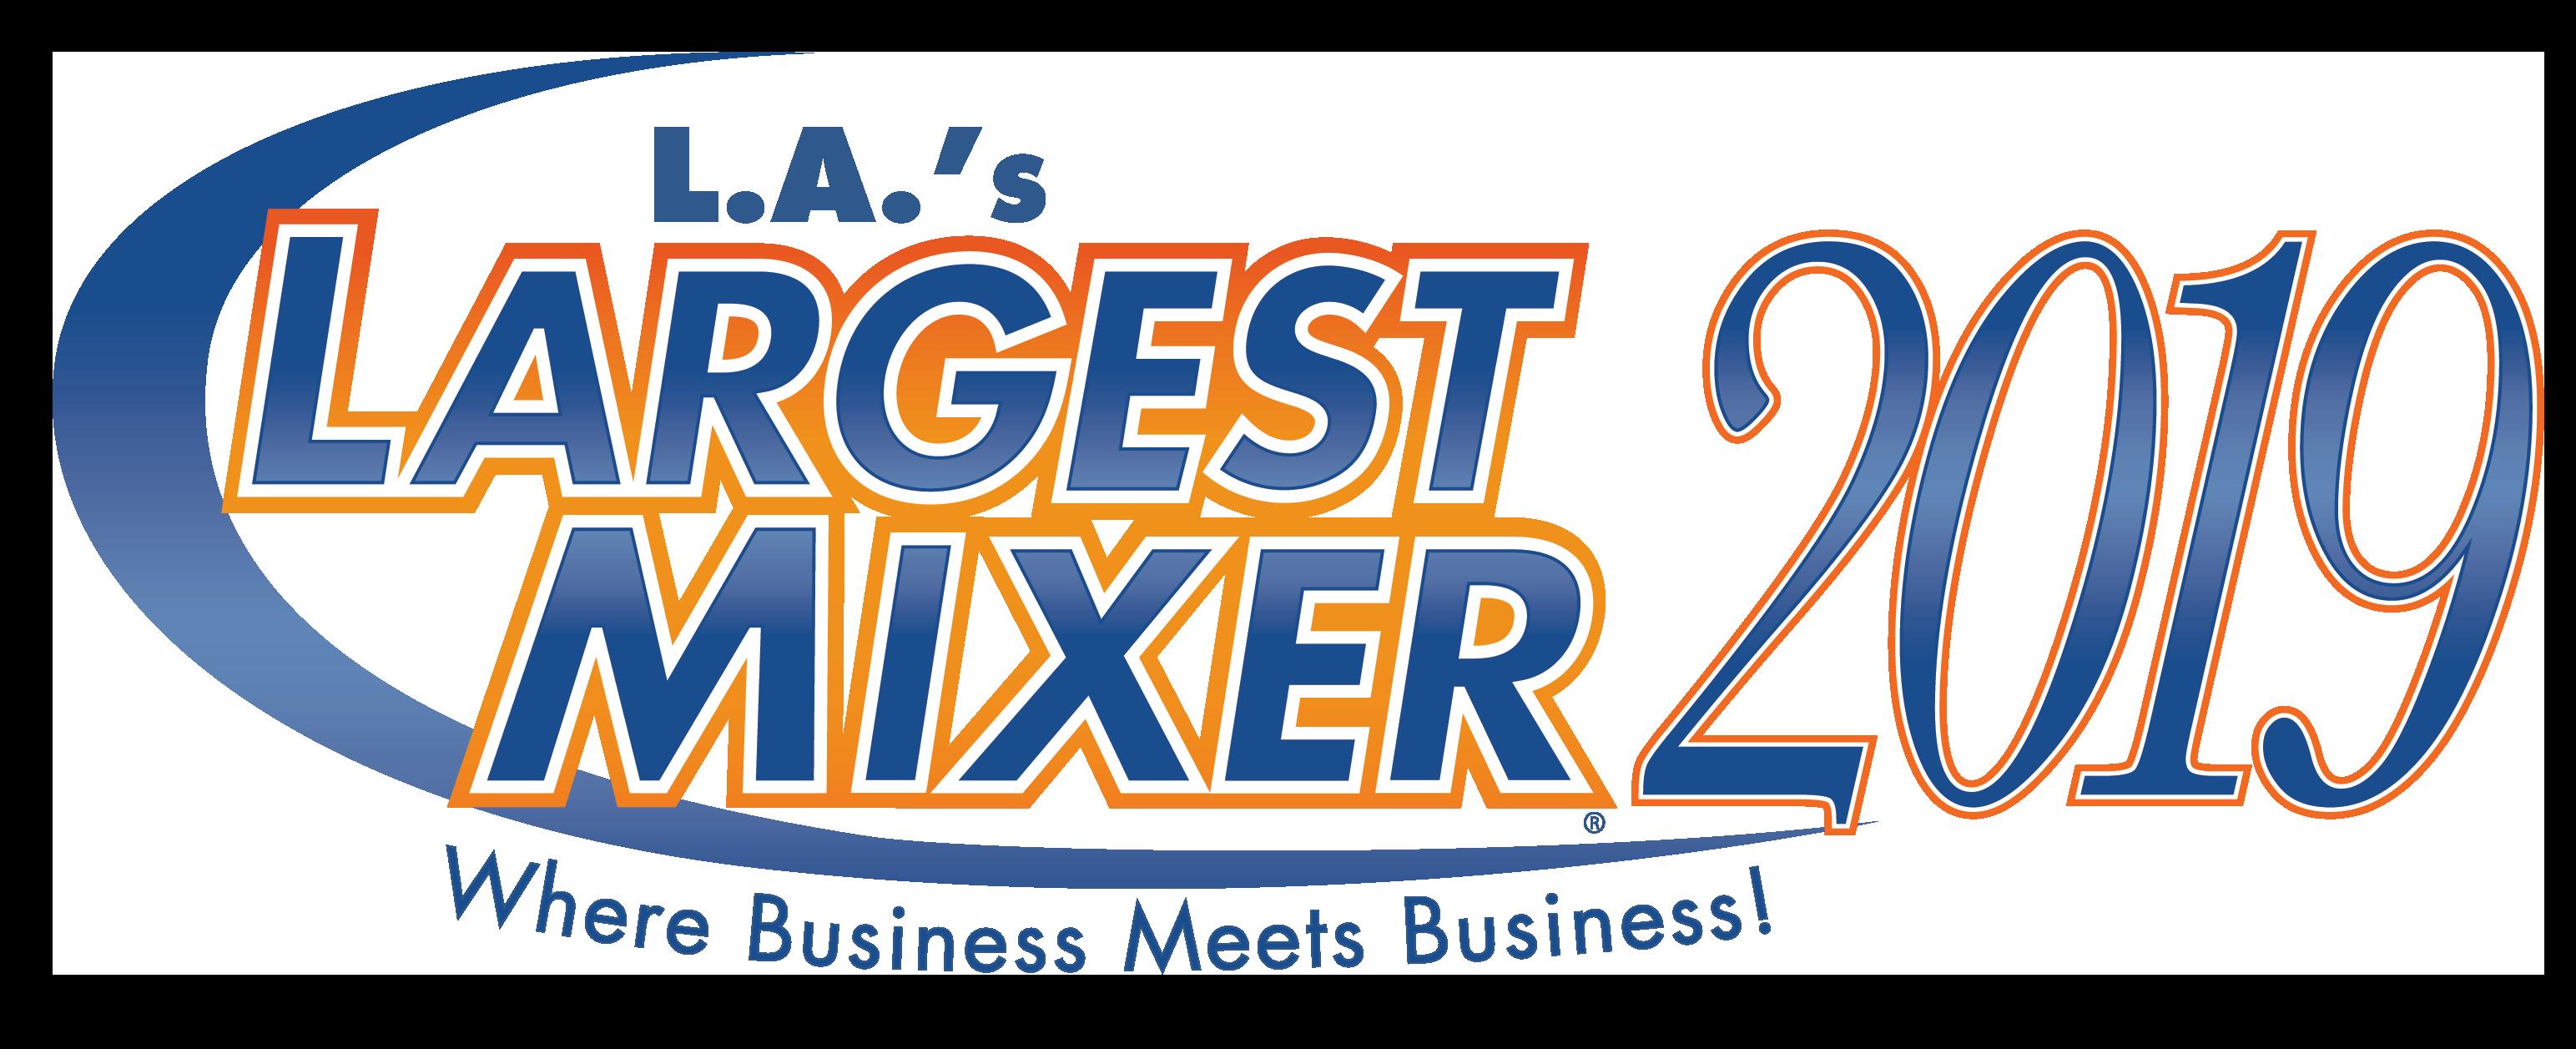 Los Angeles Past Exhibitors - Largest Mixer